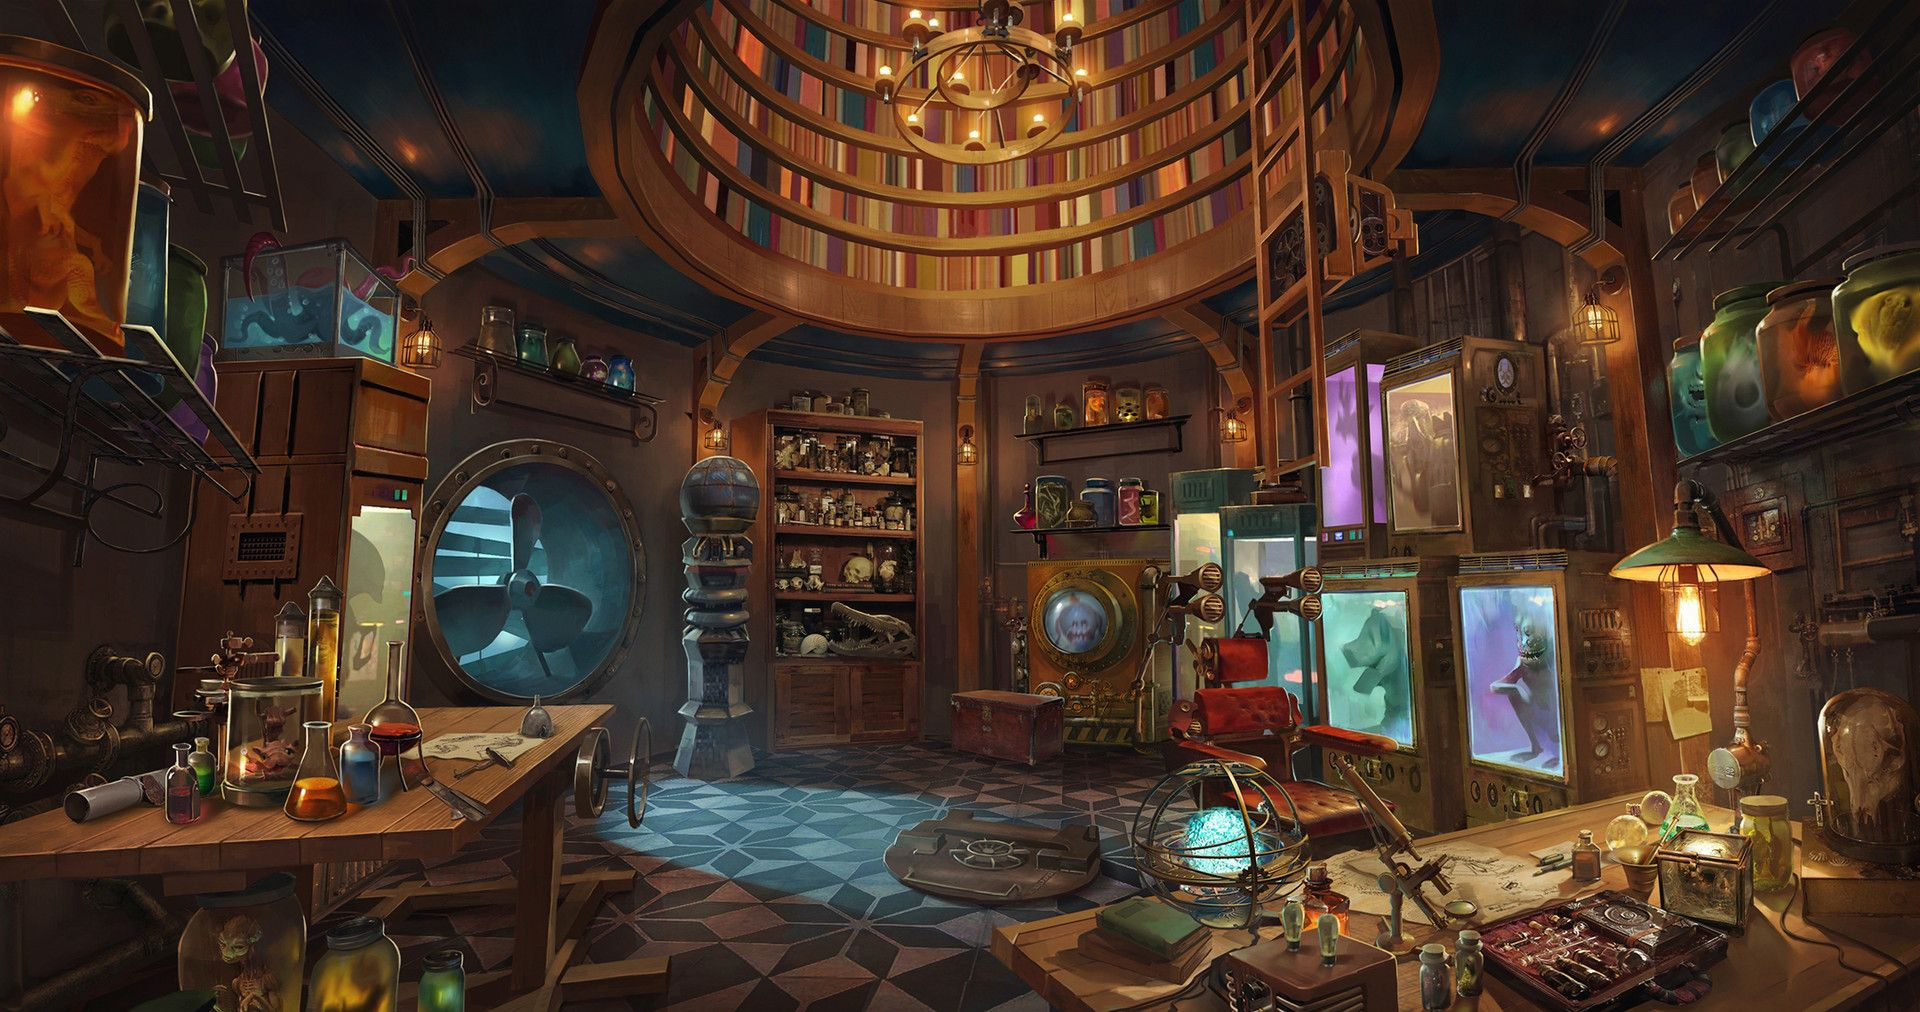 Artstation monster ego studios shawn lee fantasy art